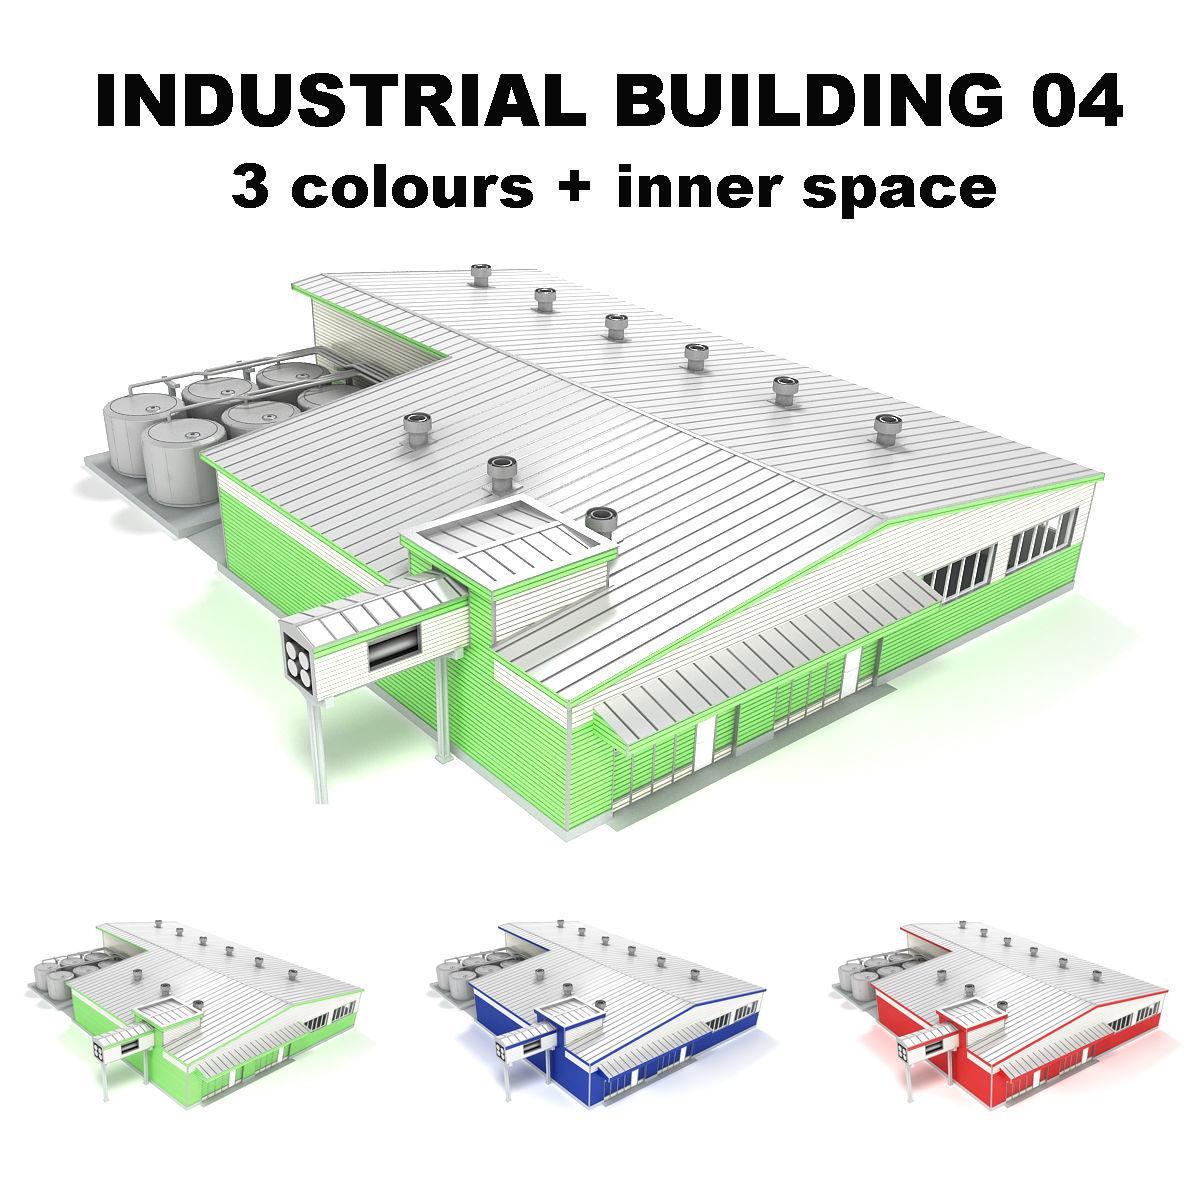 Industrial building 04